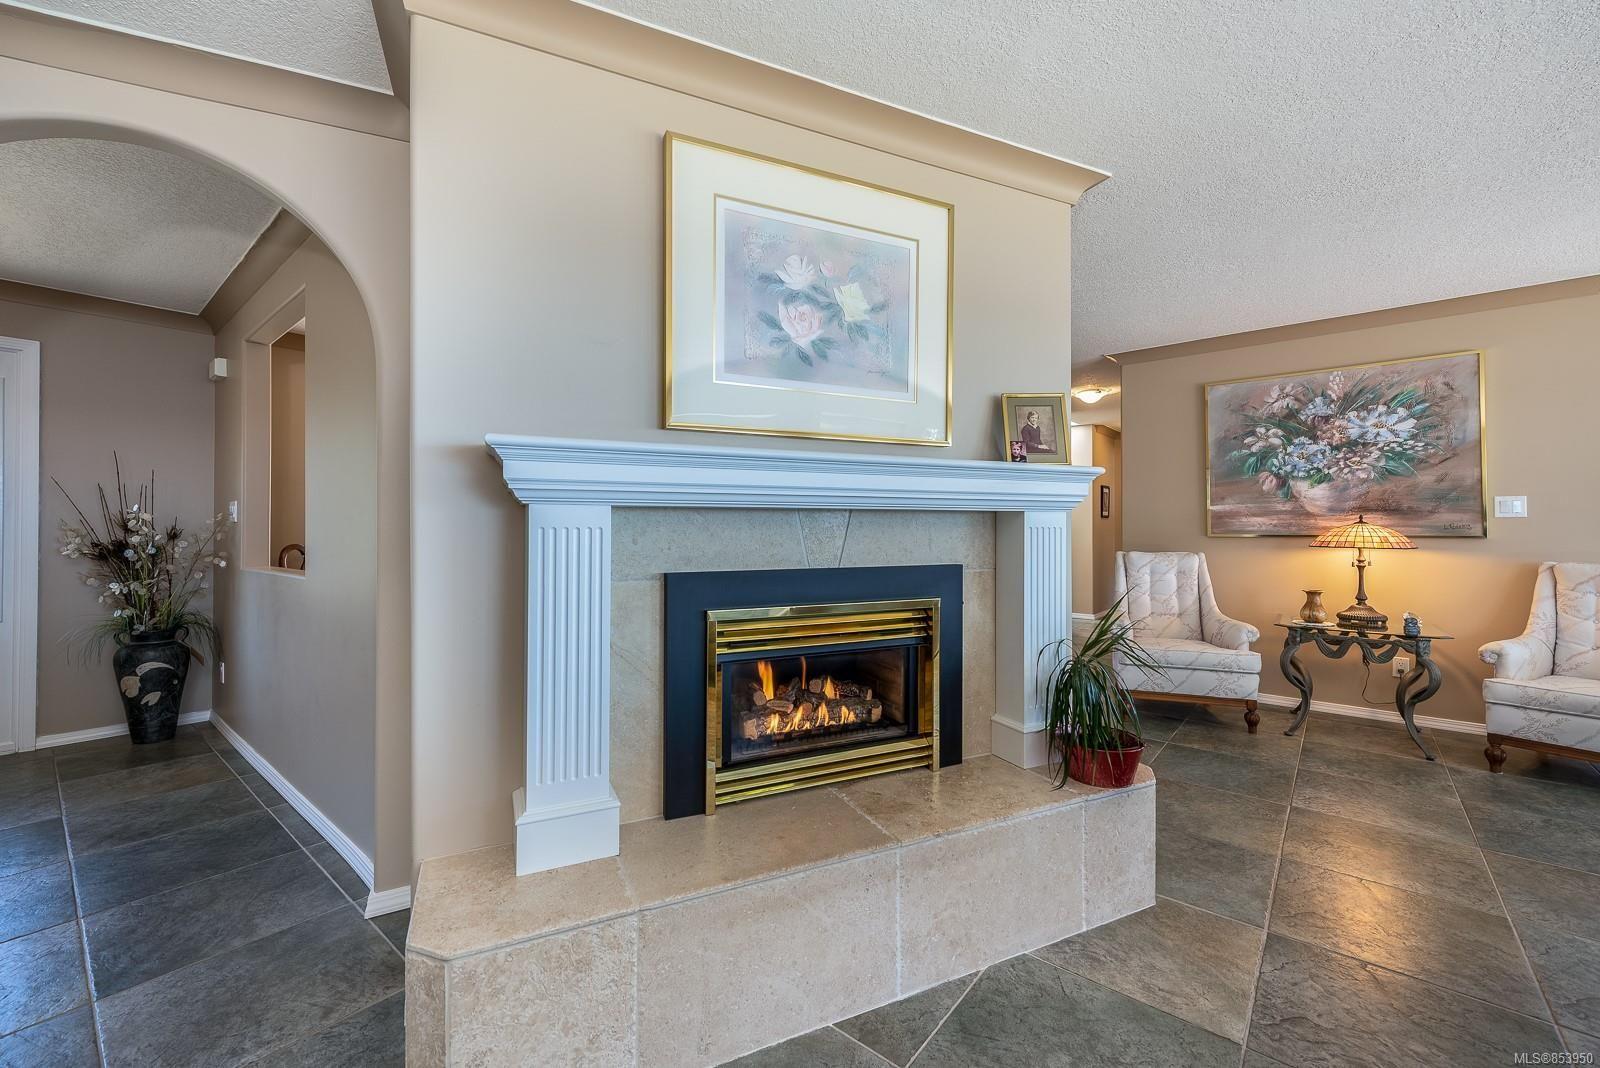 Photo 20: Photos: 5880 GARVIN Rd in : CV Union Bay/Fanny Bay House for sale (Comox Valley)  : MLS®# 853950